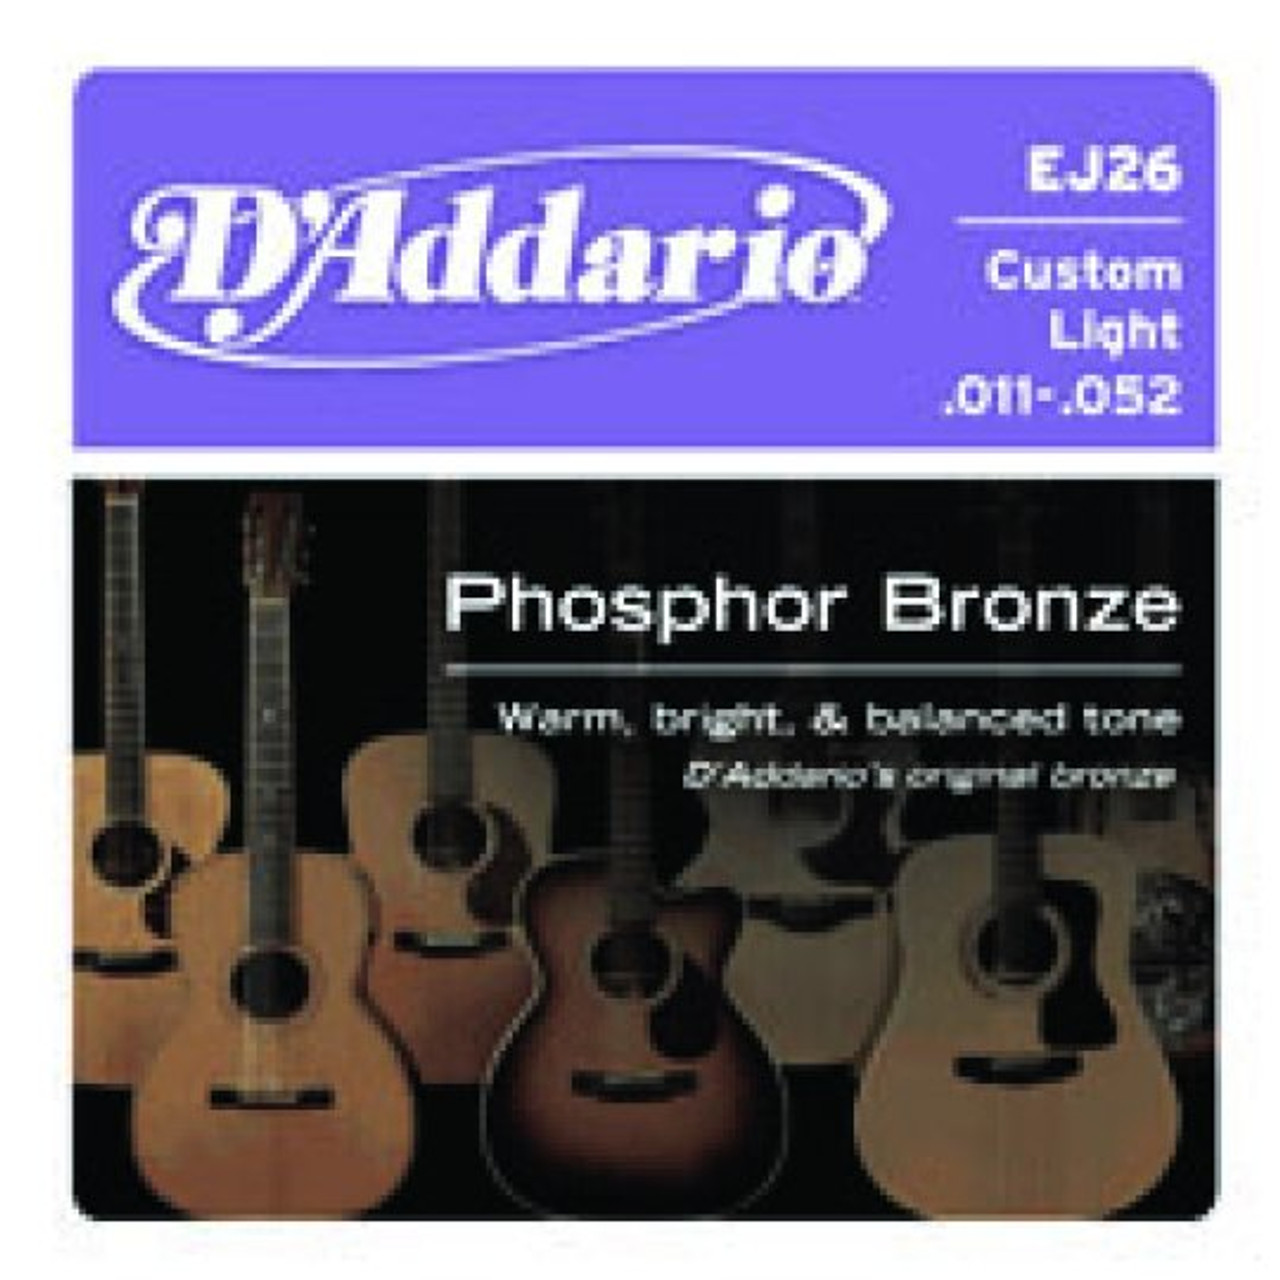 D'addario Custom Light Phosphor Bronze Acoustic Strings (11-52)